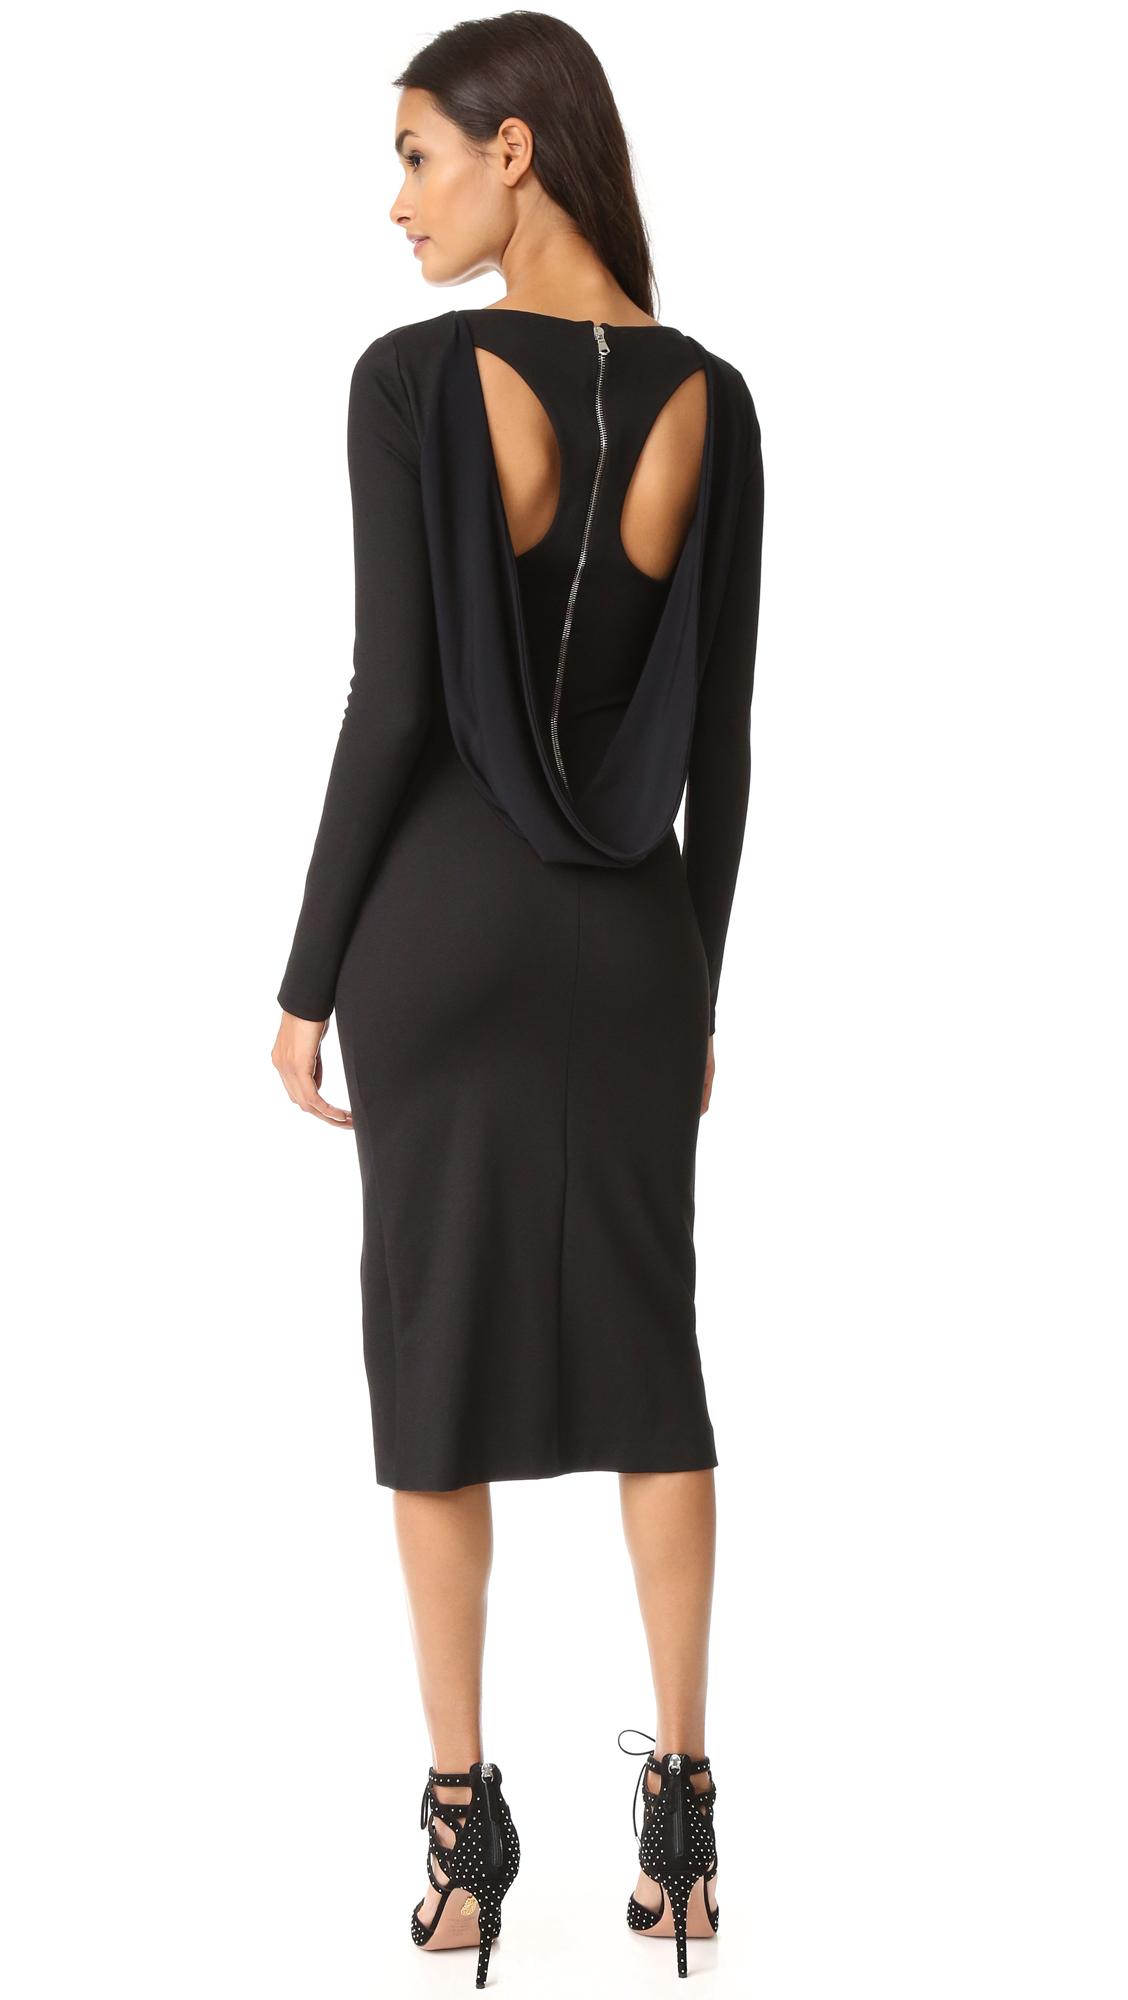 Antonio Berardi Long Sleeve Dress - Black at Shopbop